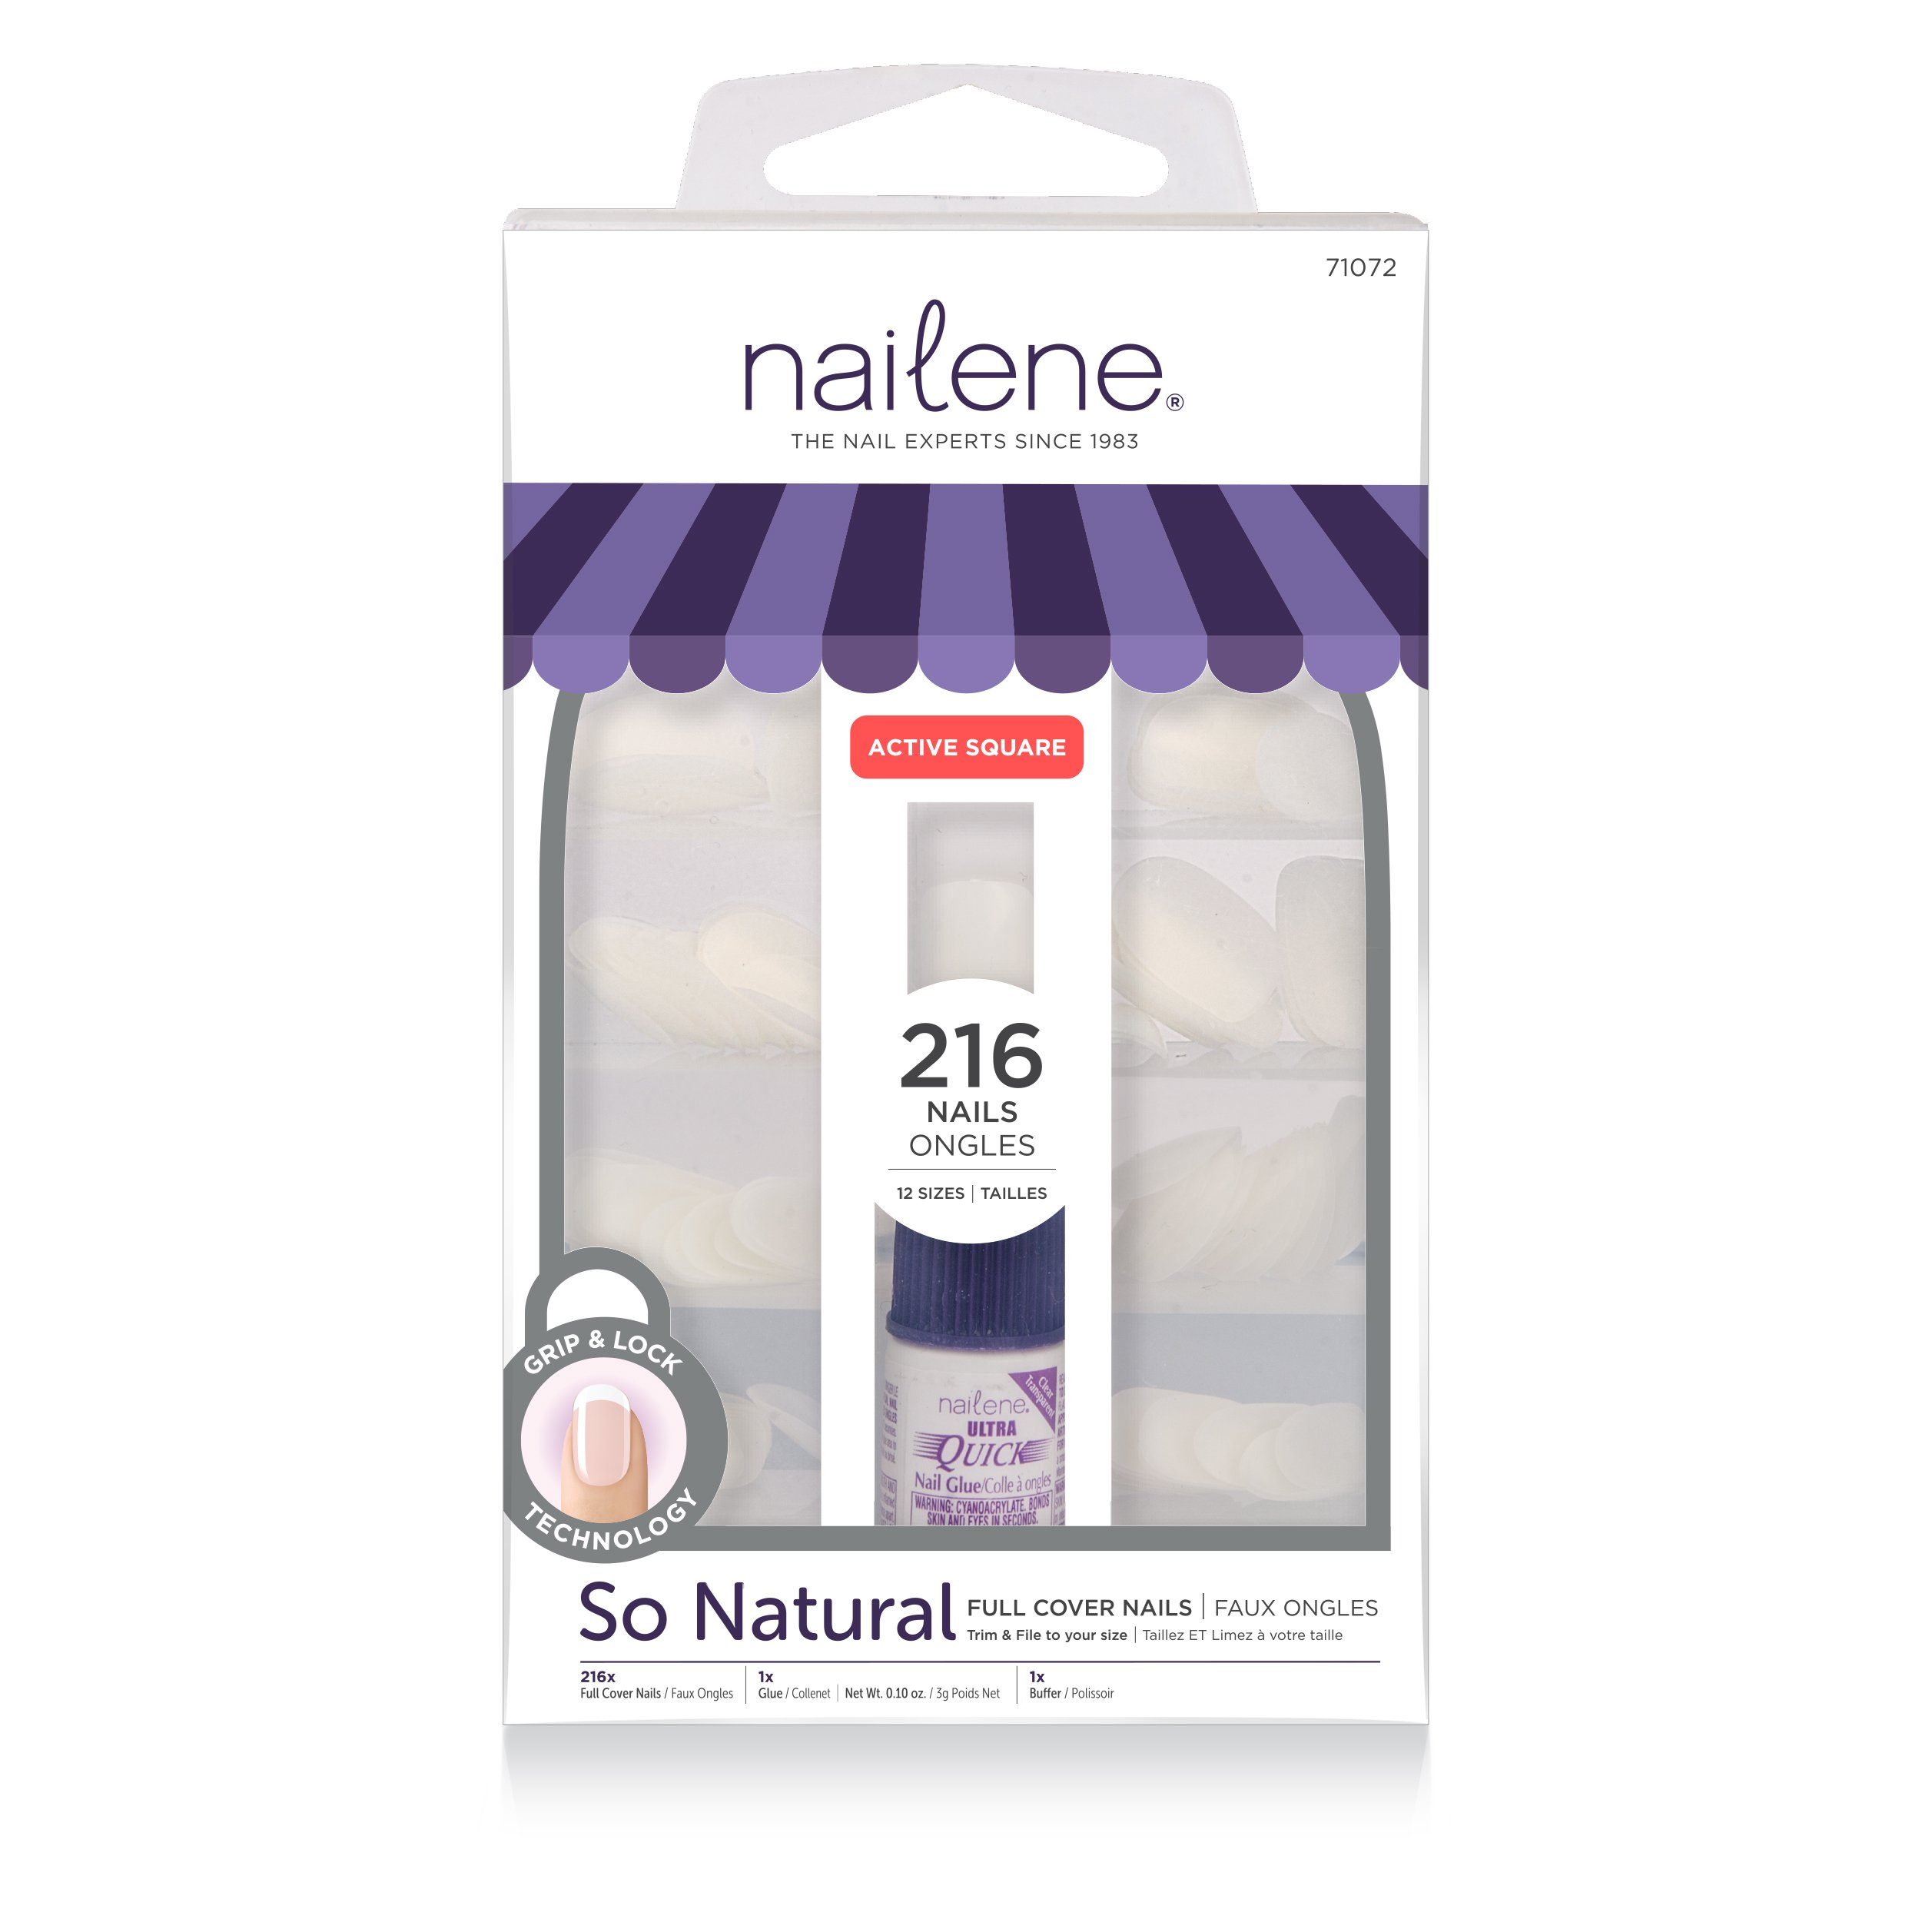 Nailene Full Cover Nail, 200 Count